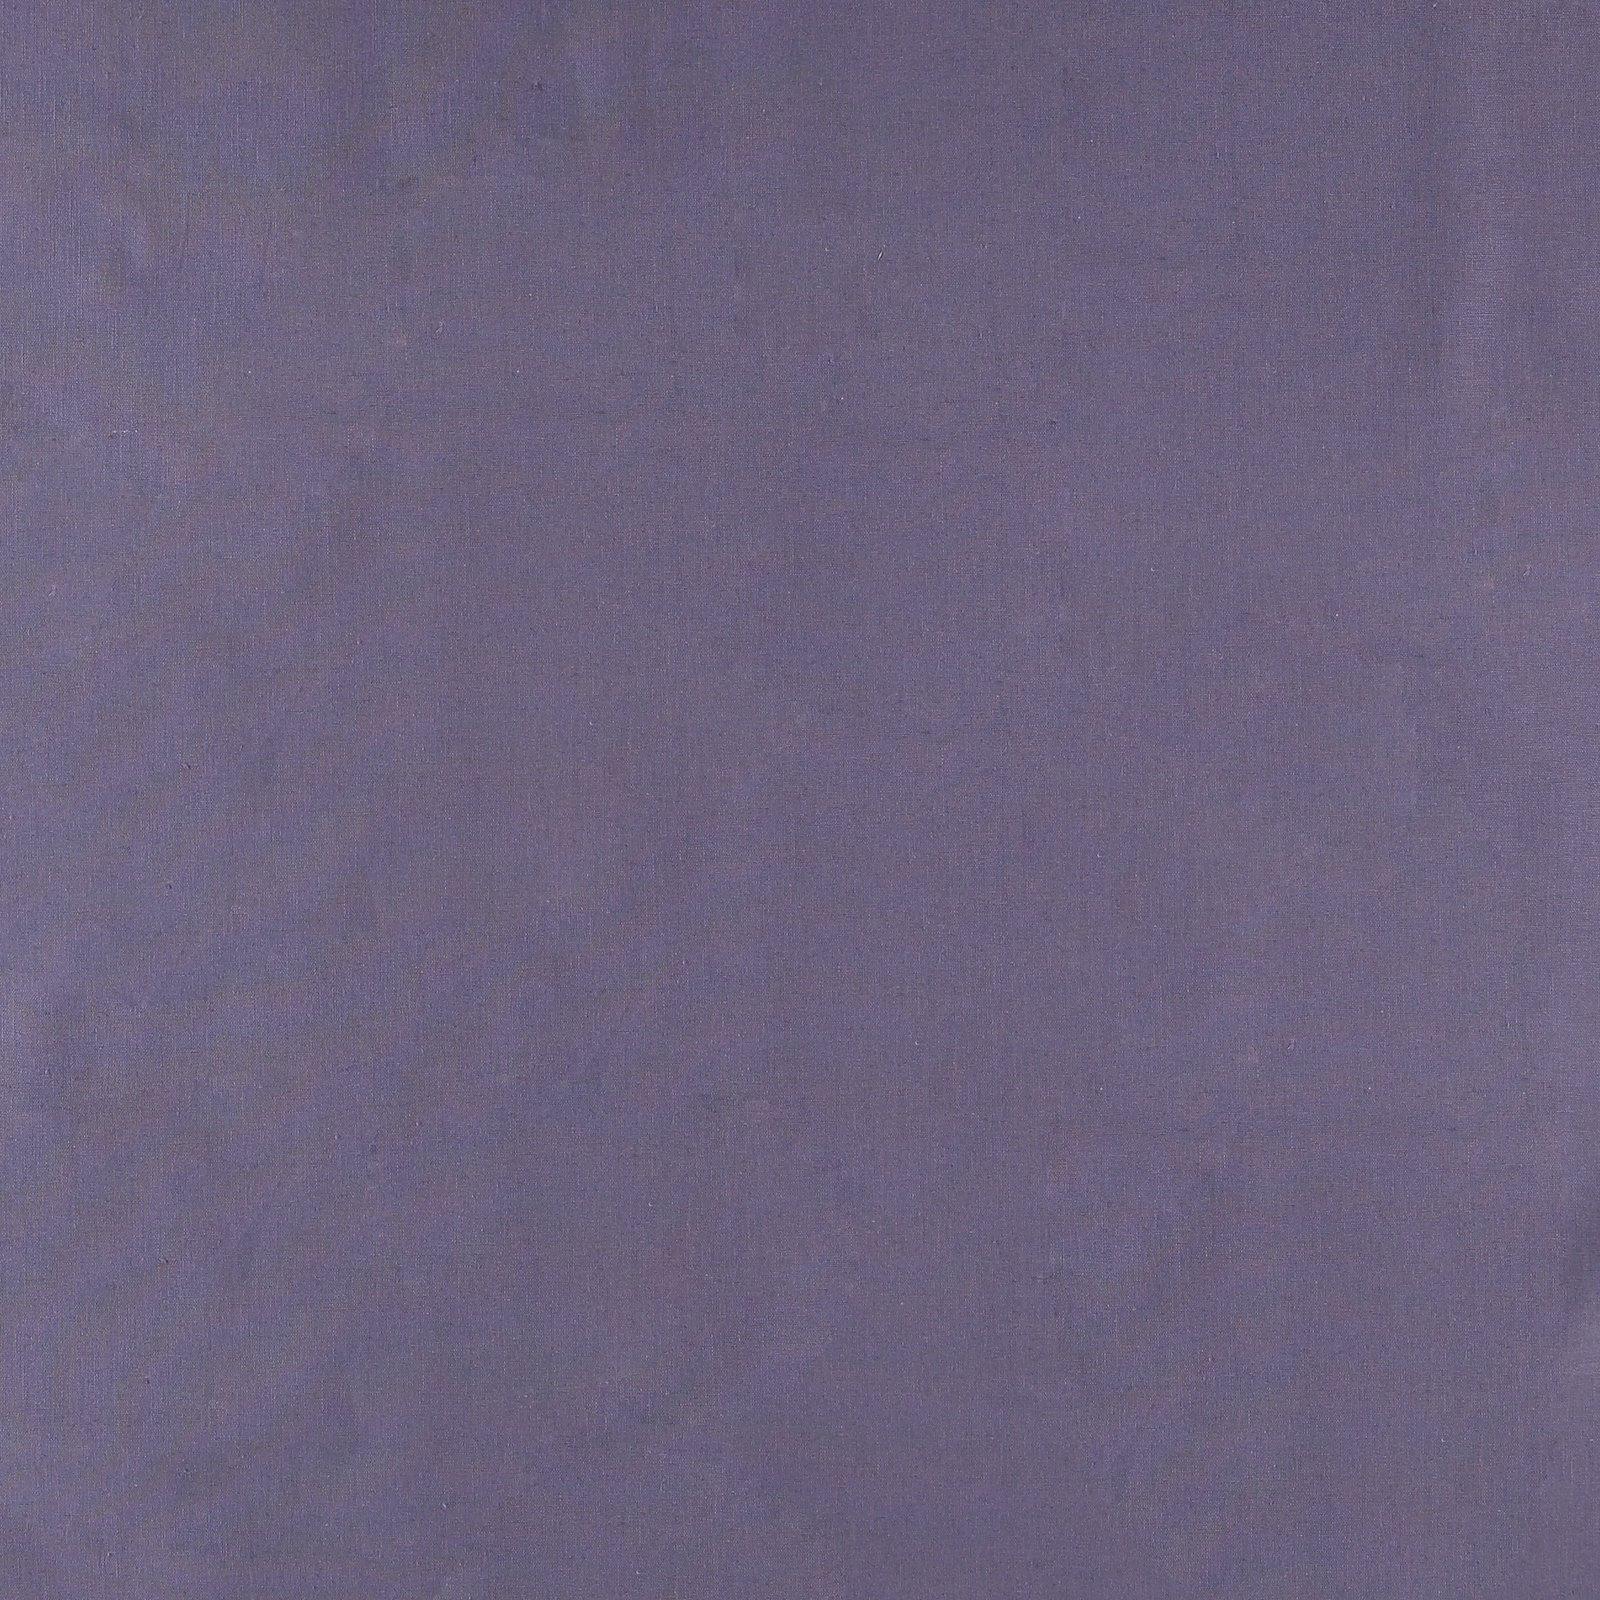 Linen/cotton dark dusty purple 410138_pack_solid